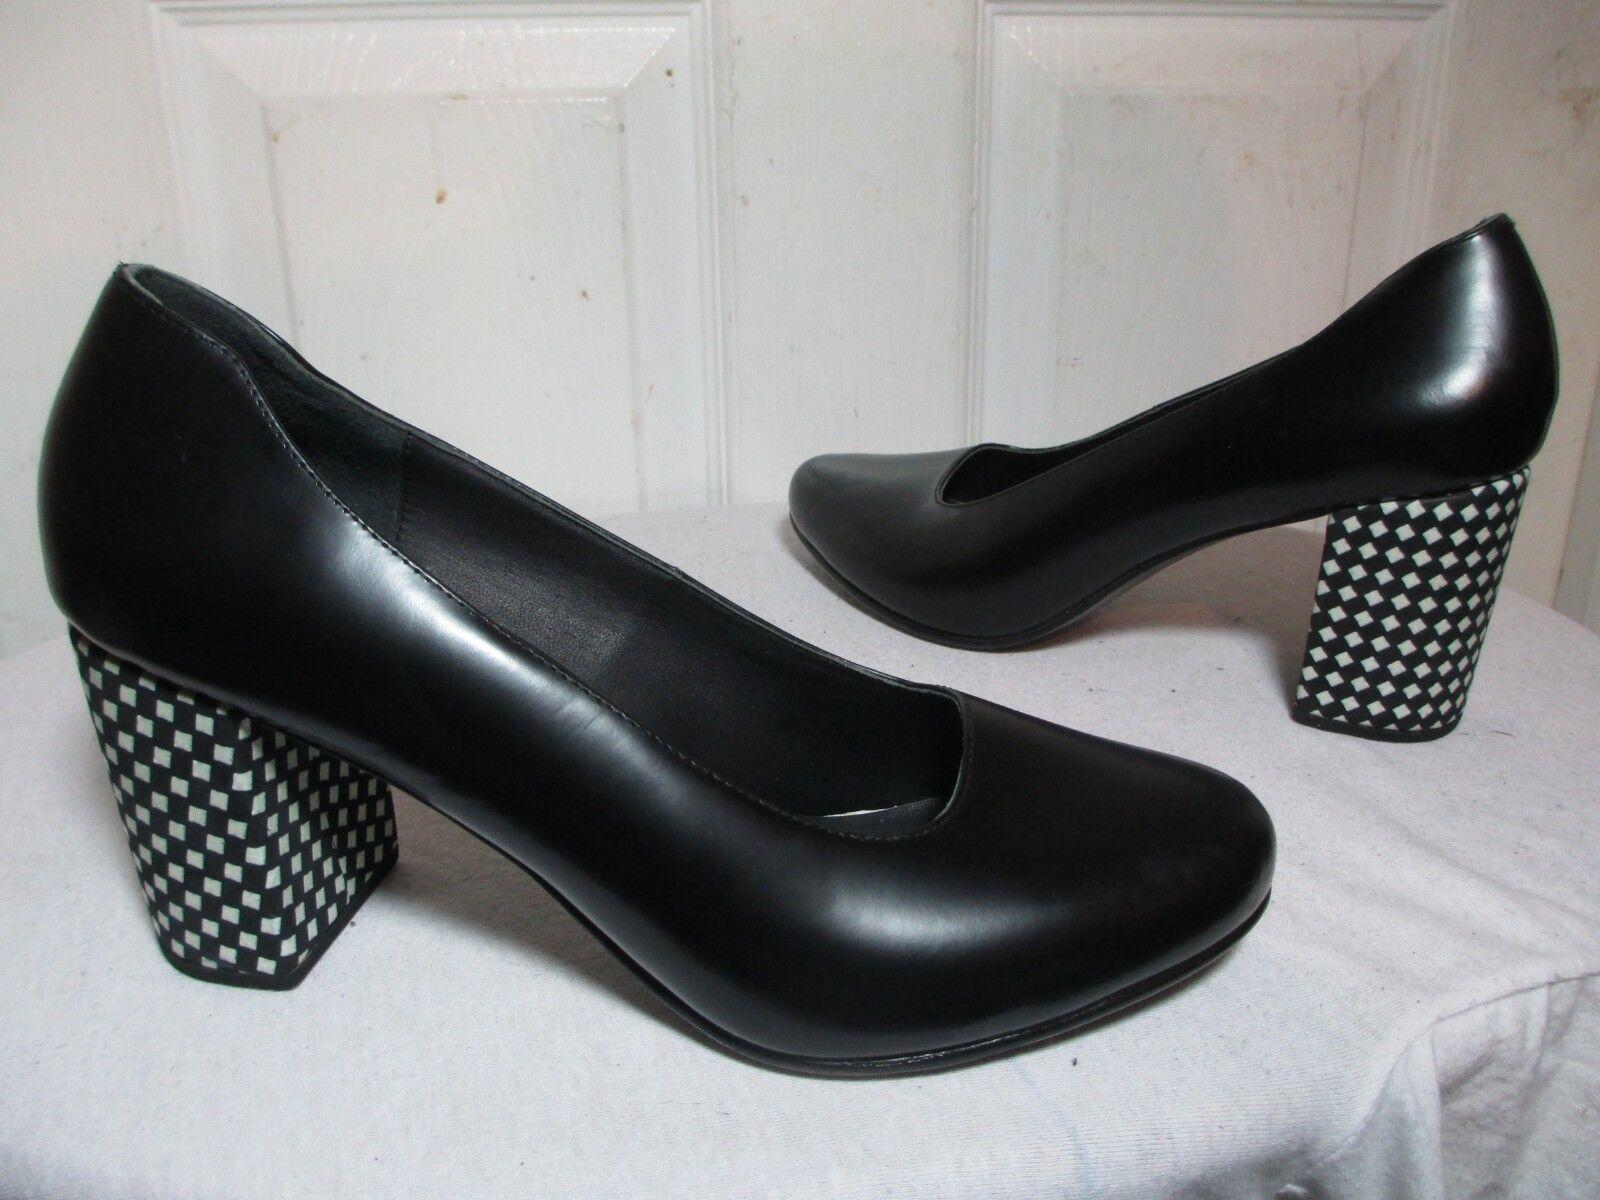 acquista marca CREATURES OF COMFORT nero MARI PUMPS PUMPS PUMPS W  nero&bianca CHECK HEELS 41 US 10  275  molto popolare